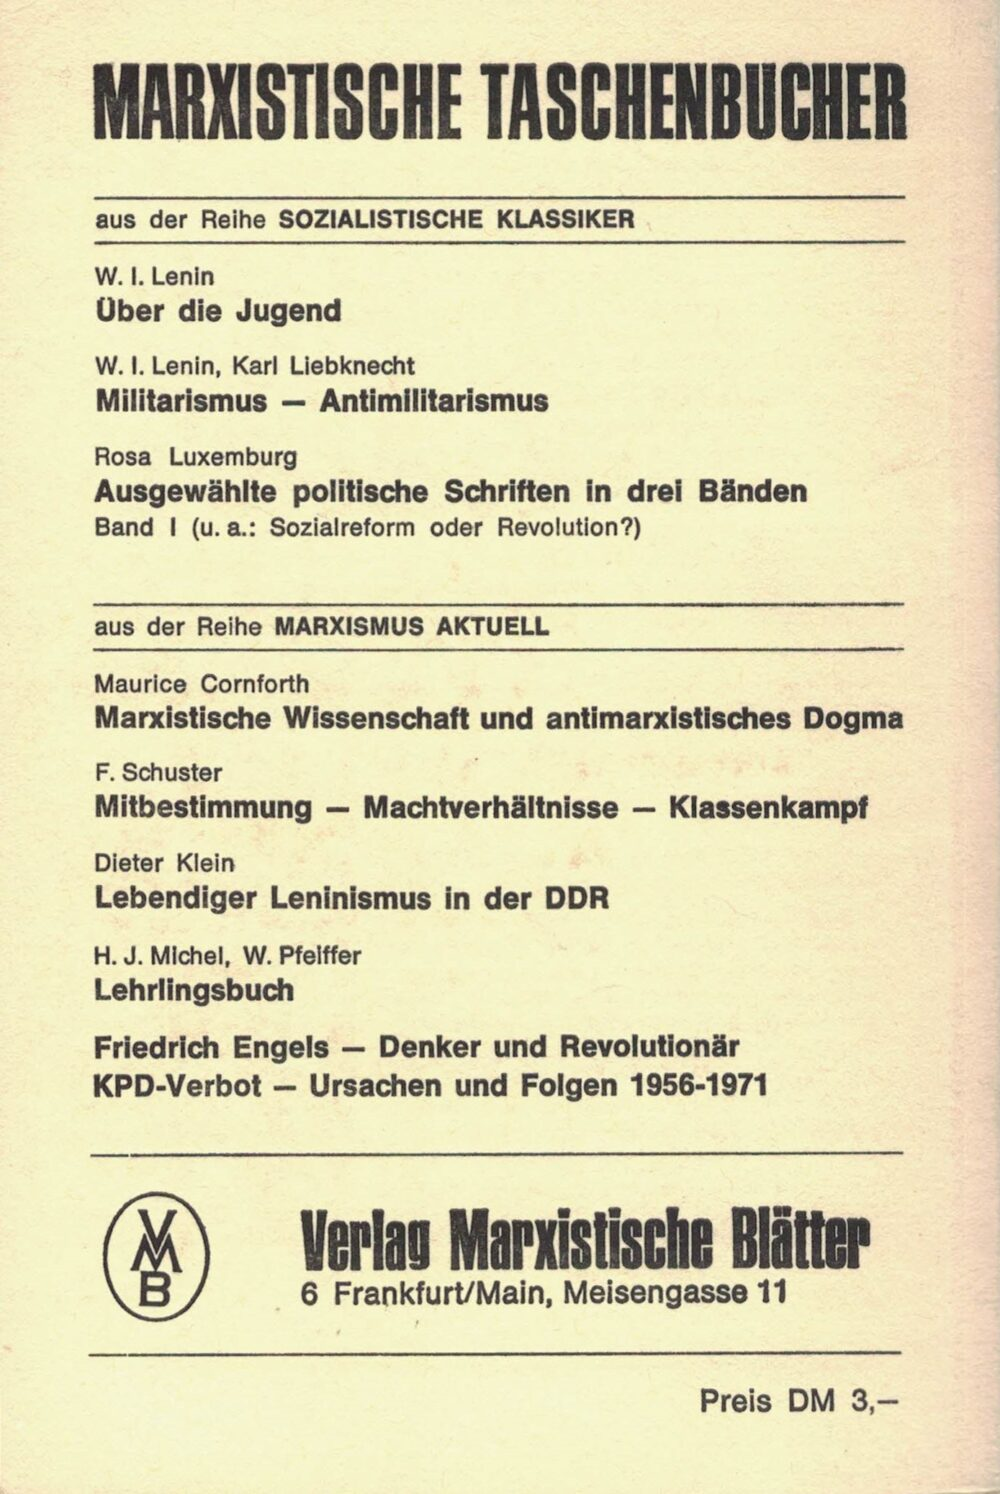 Karl Marx - Der achtzehnte Brumaire des Louis Bonaparte